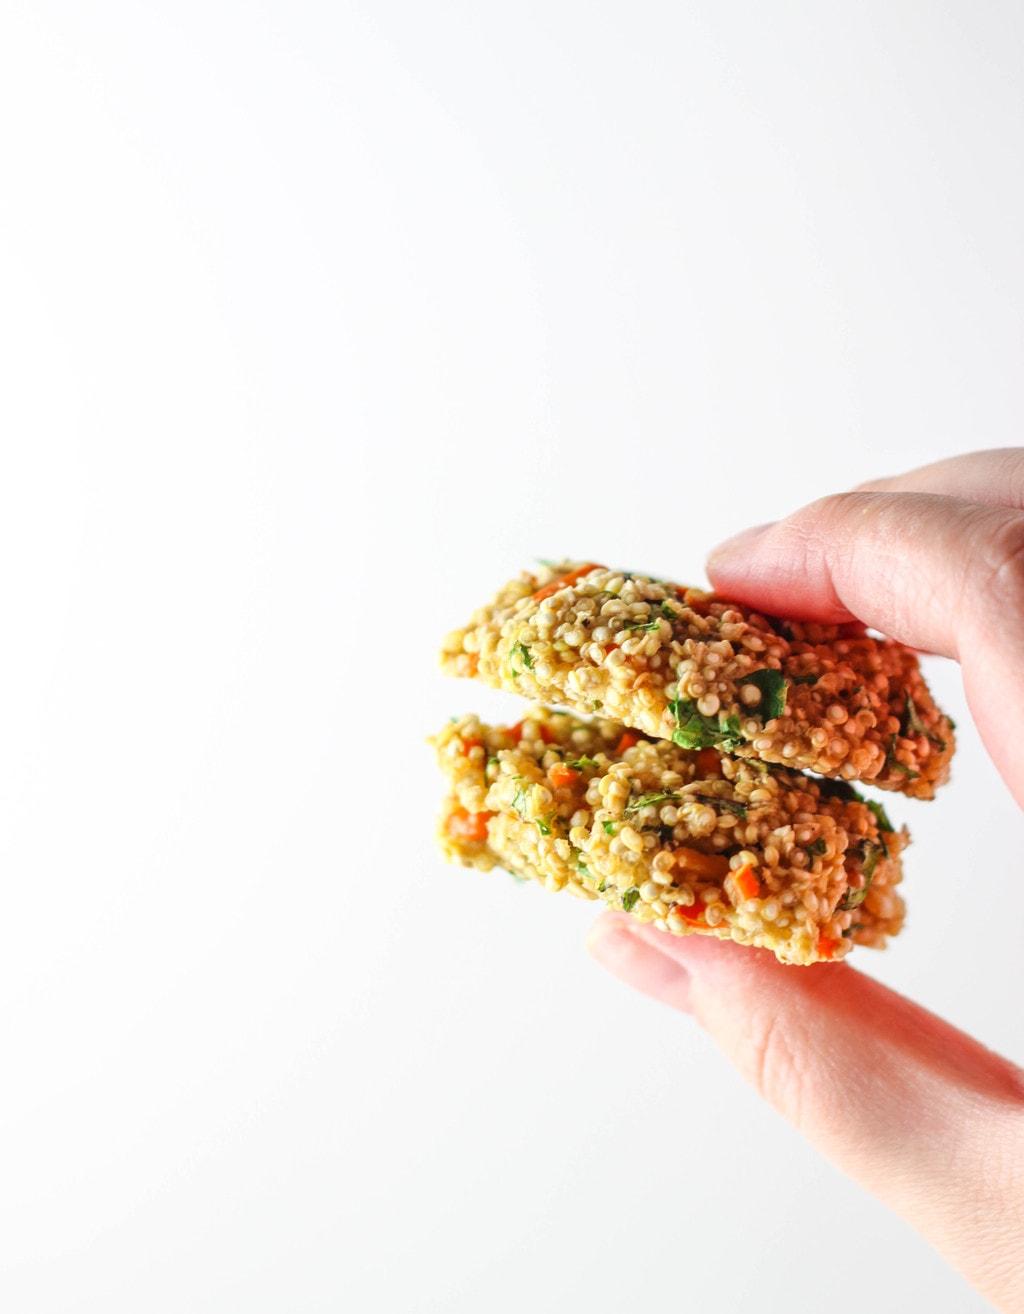 Mini Baked Quinoa Patties